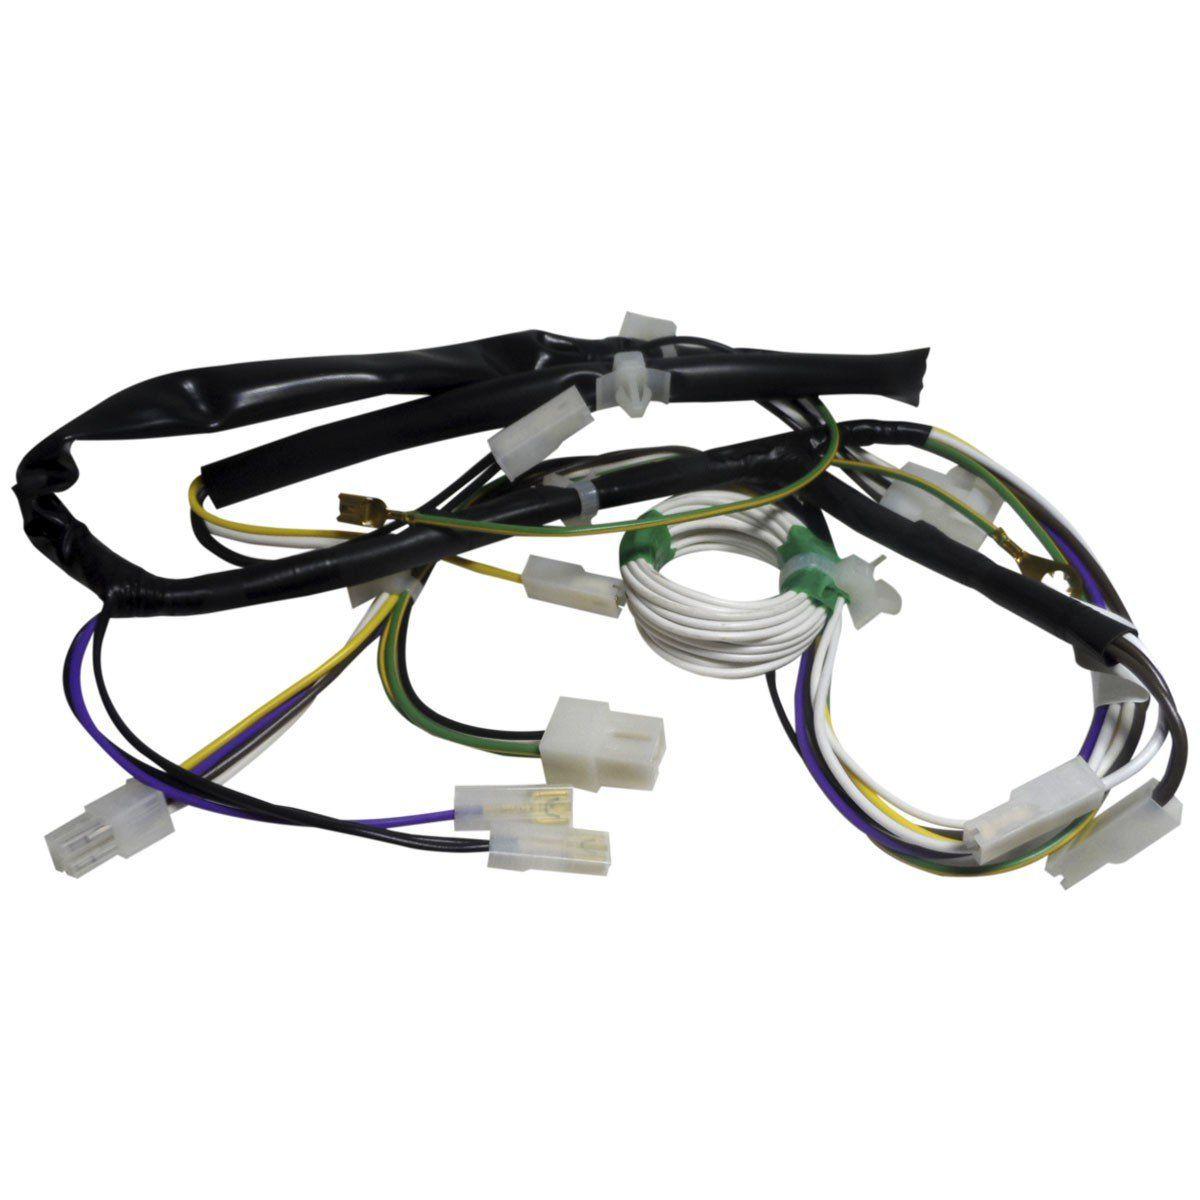 REDE ELÉTRICA INFERIOR LAVADORA ELECTROLUX 64590798